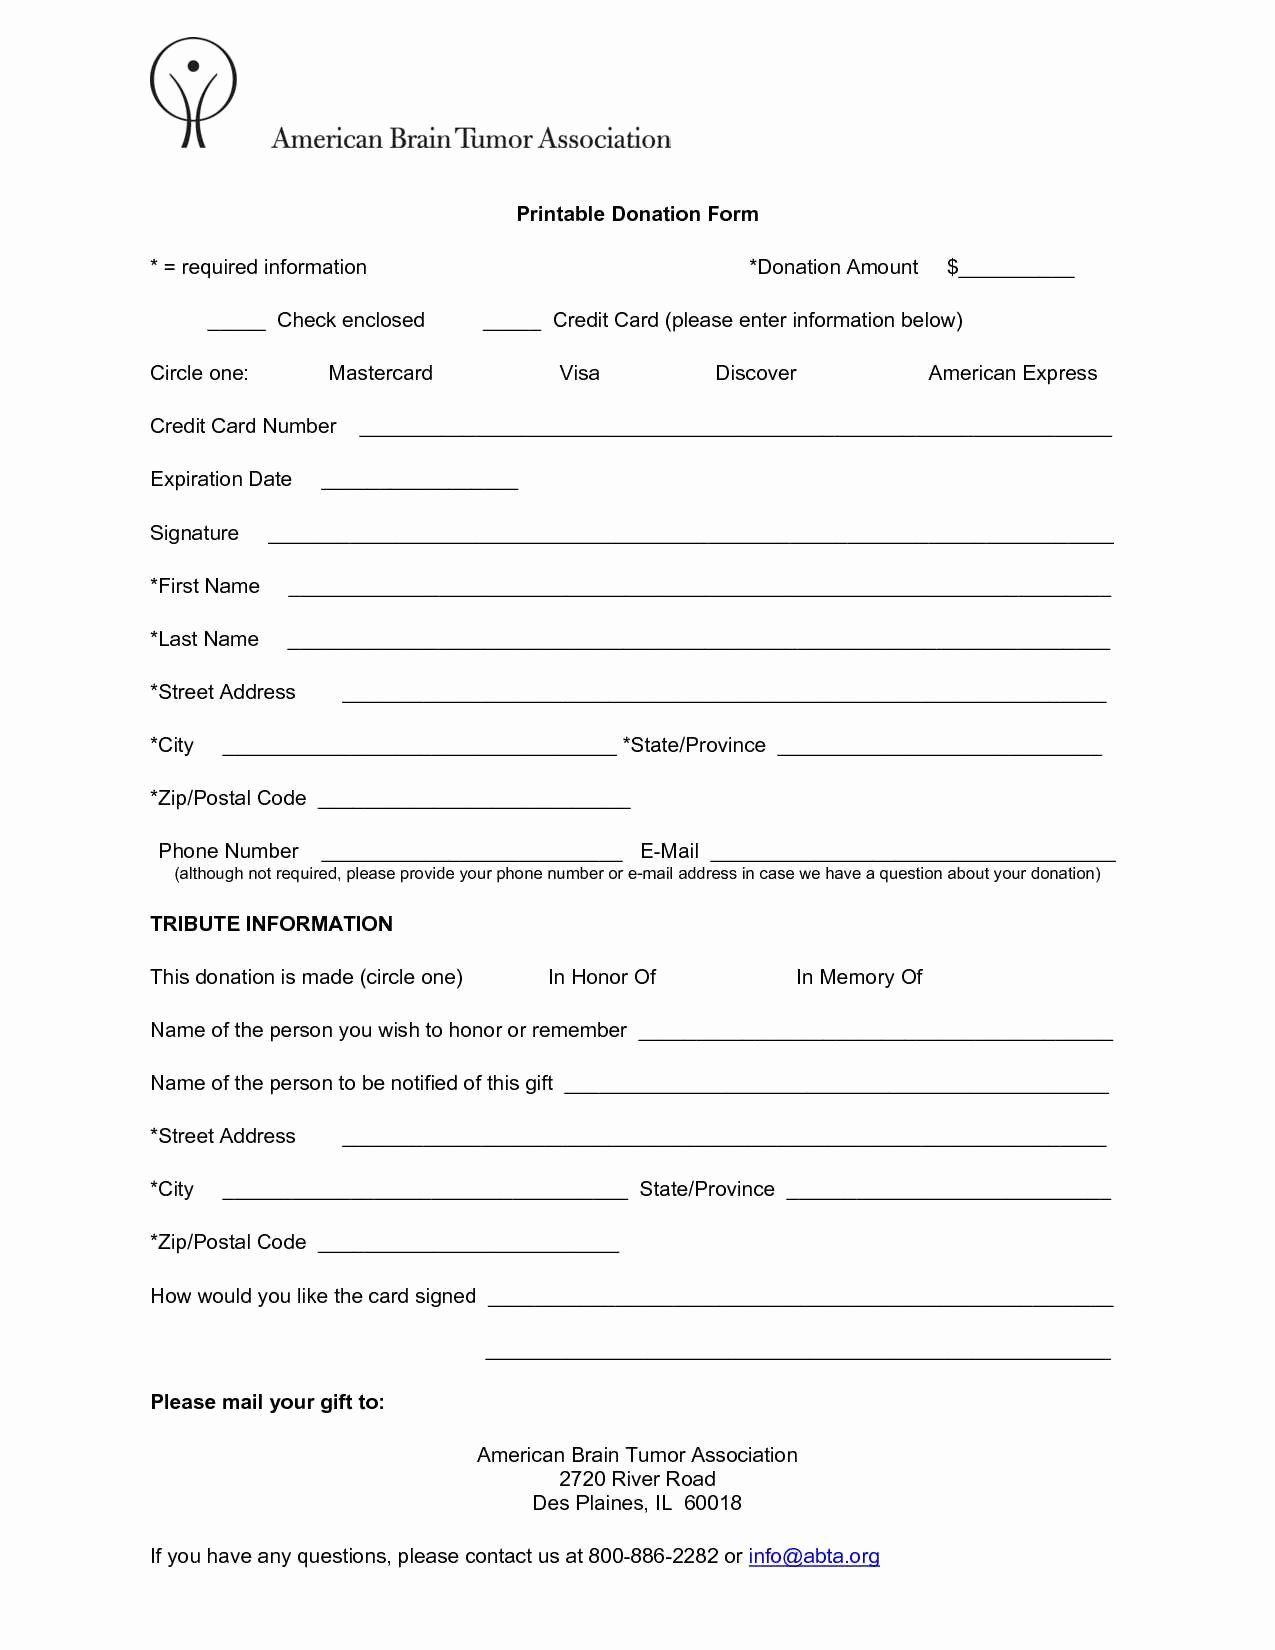 Donation Pledge Form Template Inspirational Charitable Donation Form Template With Pledge Templa On Donation Form Donation Request Form Word Template